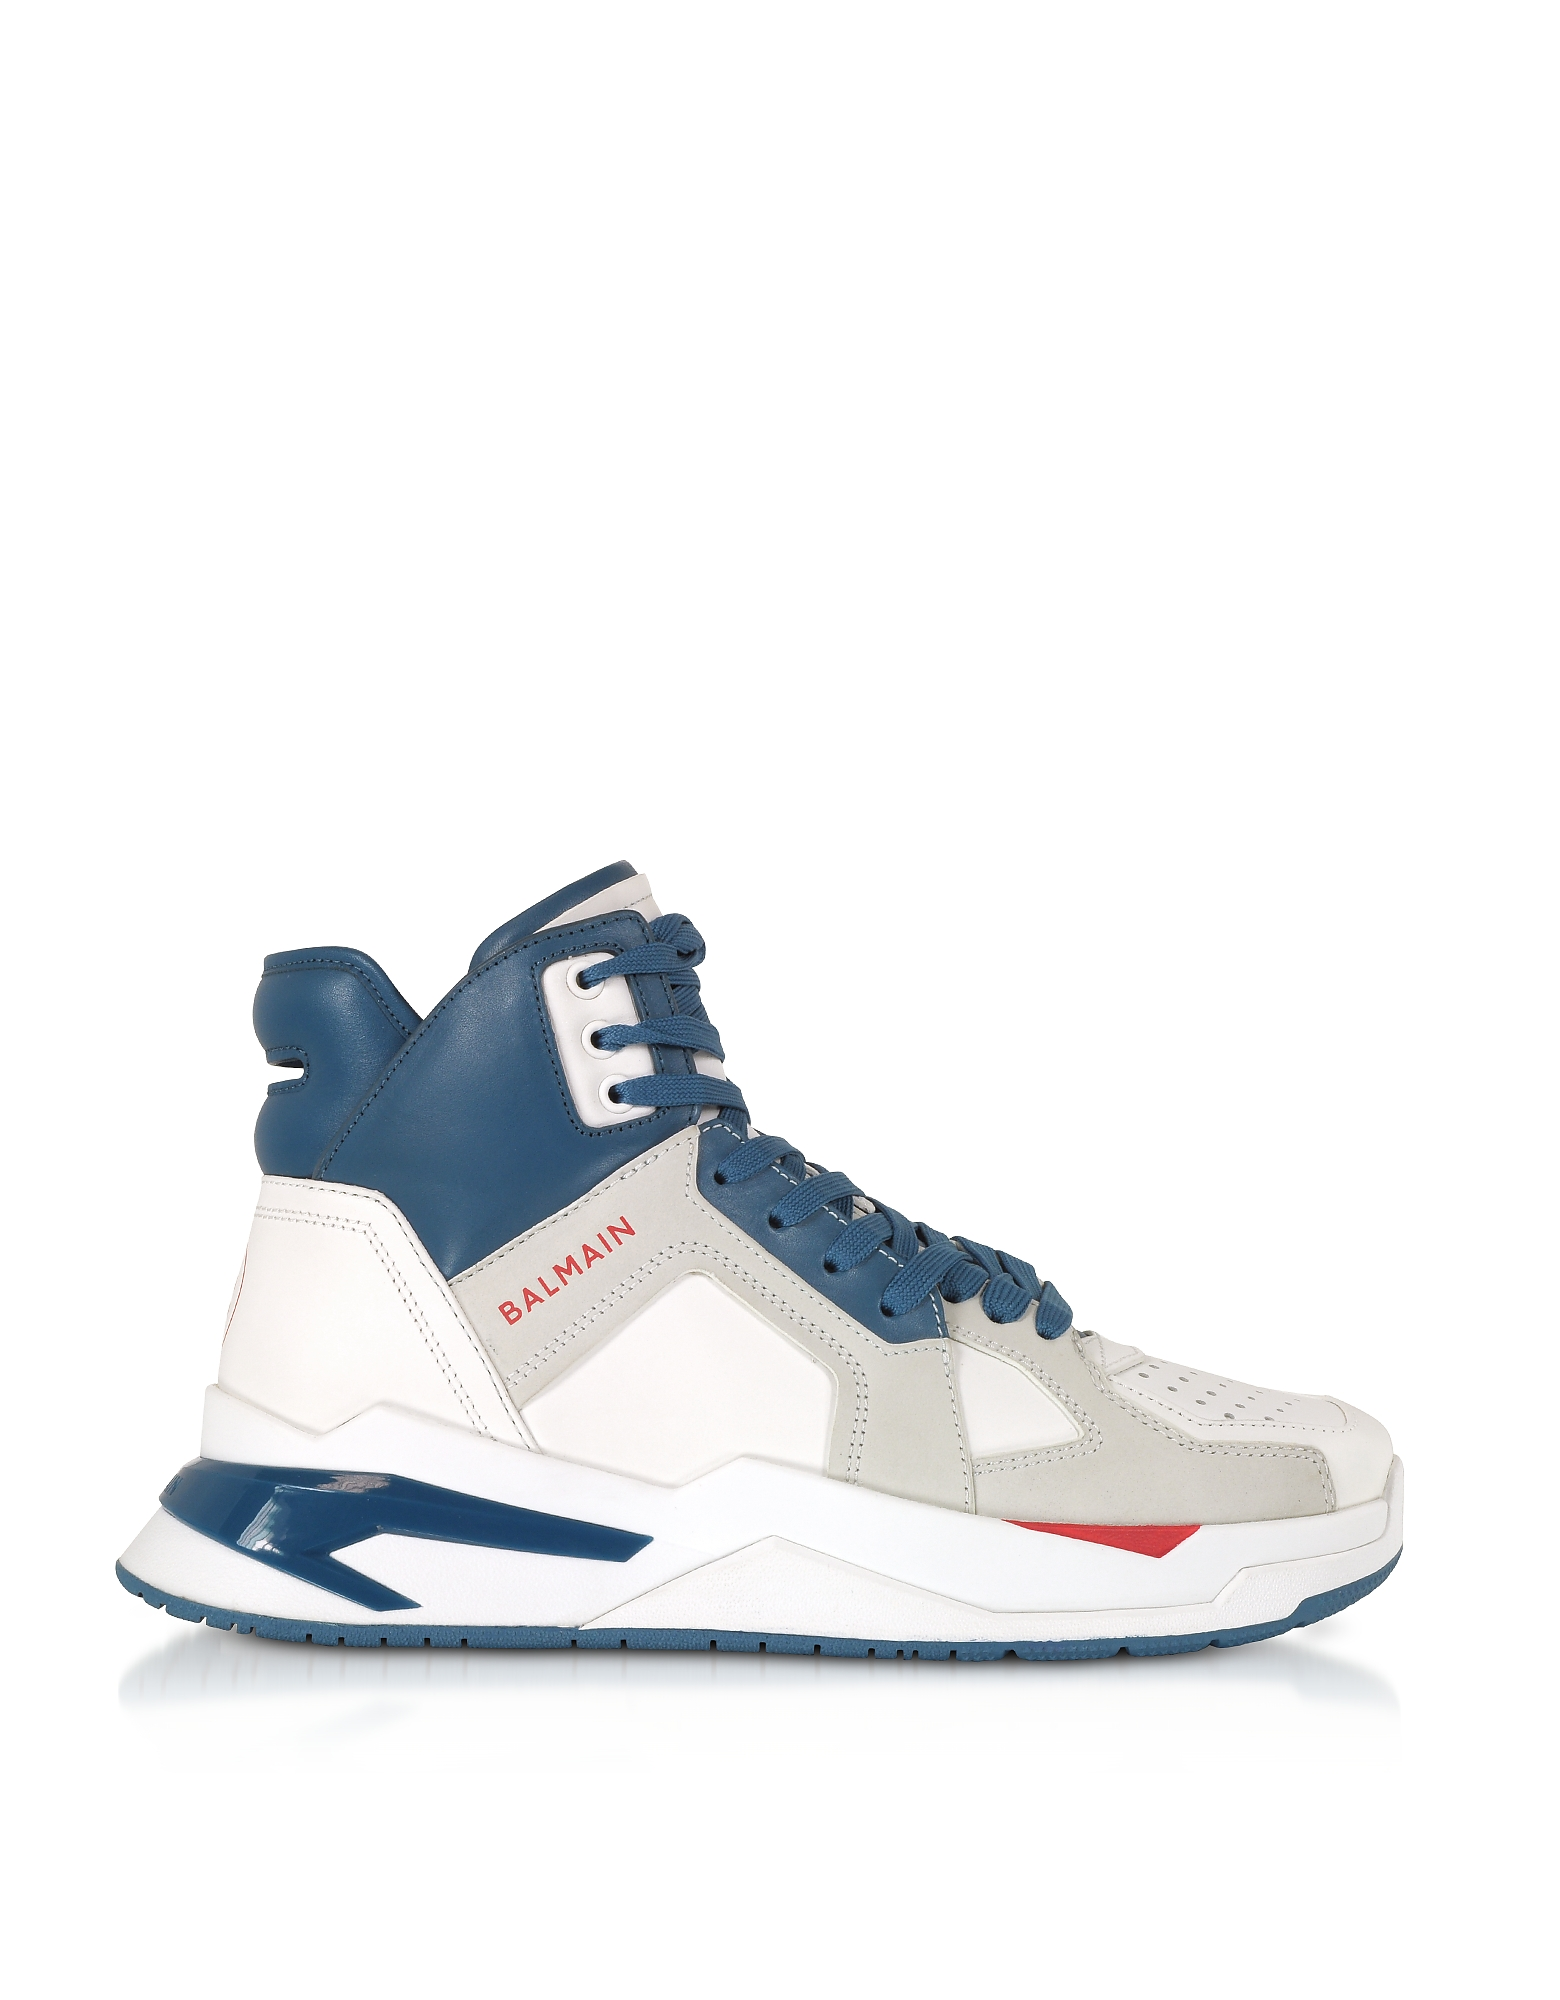 Balmain Designer Shoes, White & Blue High Top Men's B-Ball Sneakers